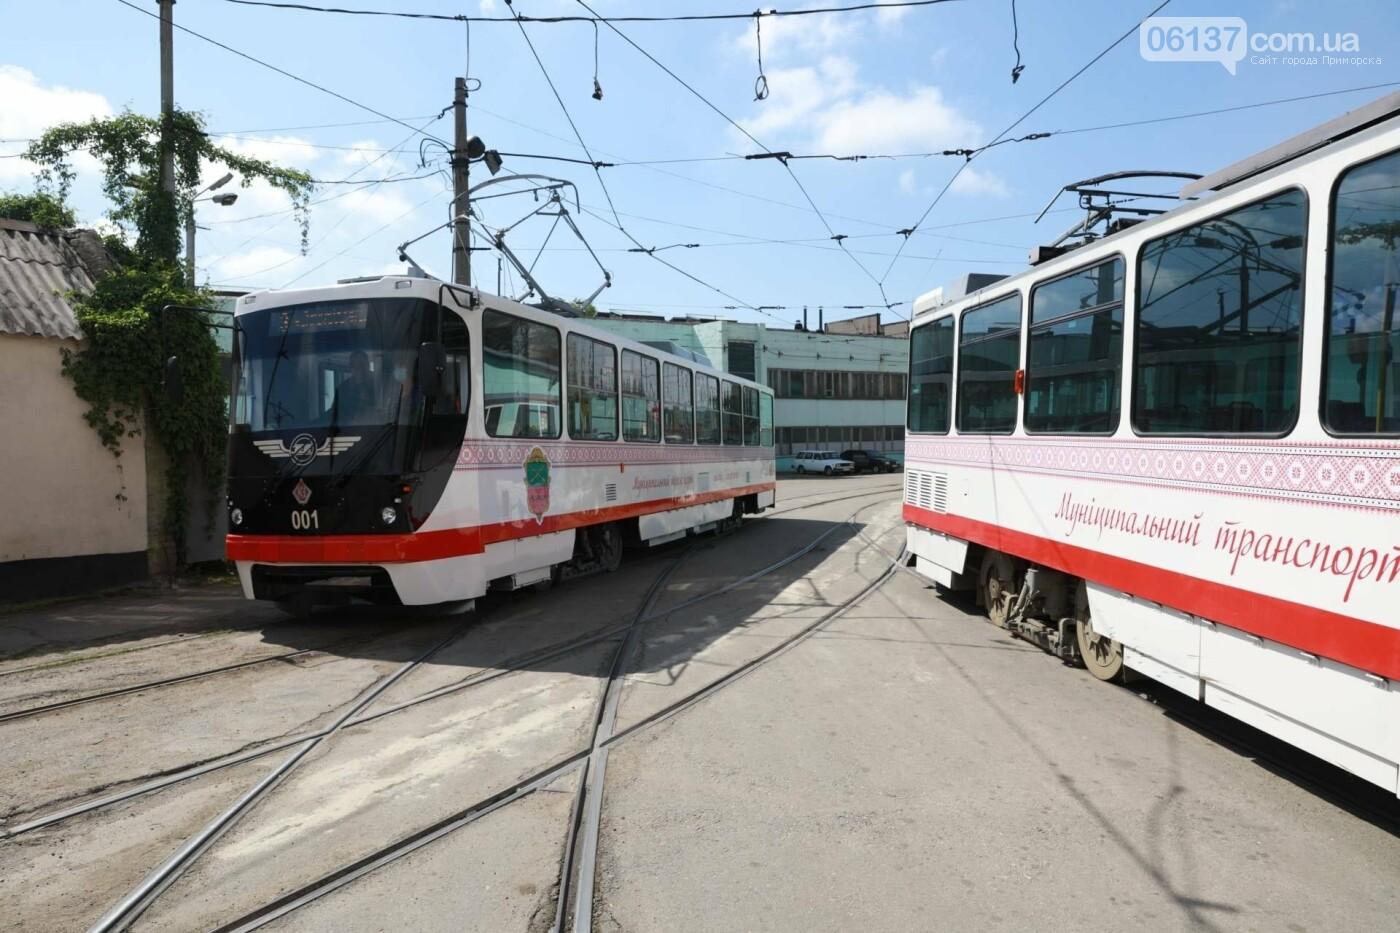 В Запорожье запустили еще один европейский трамвай. Фото, фото-6